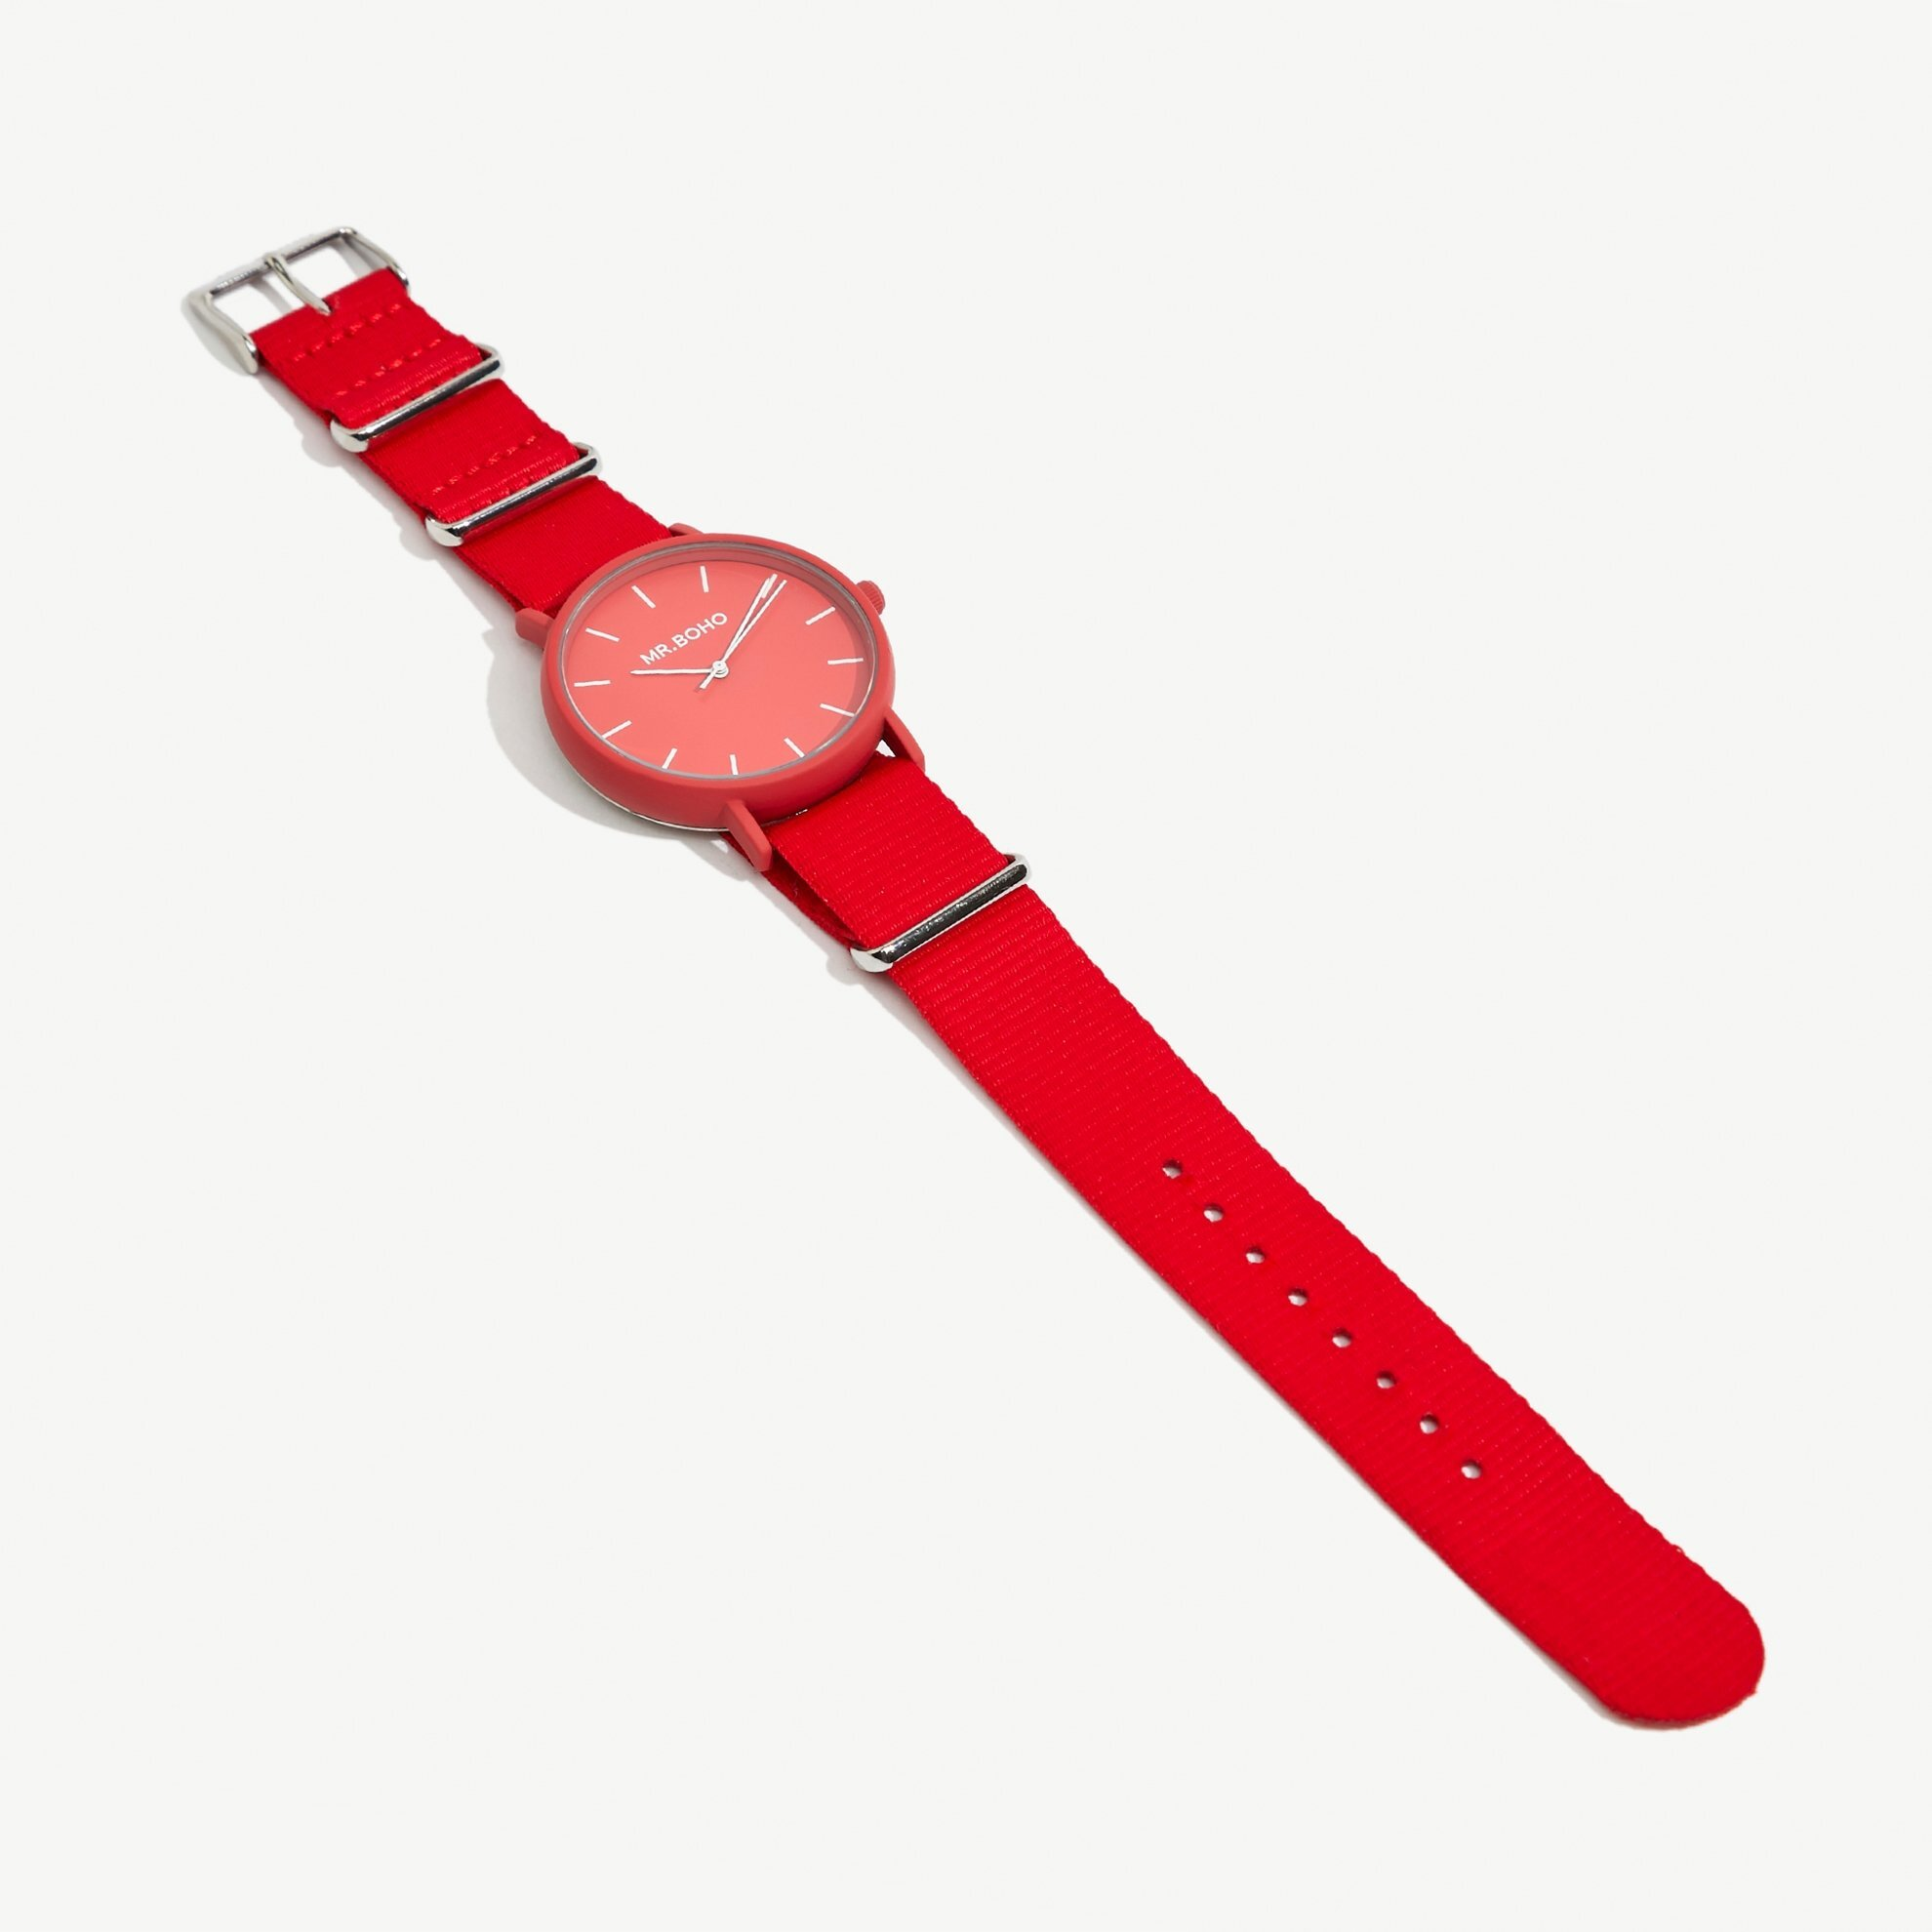 resm Mr. Boho Kanvas Kayışlı Saat